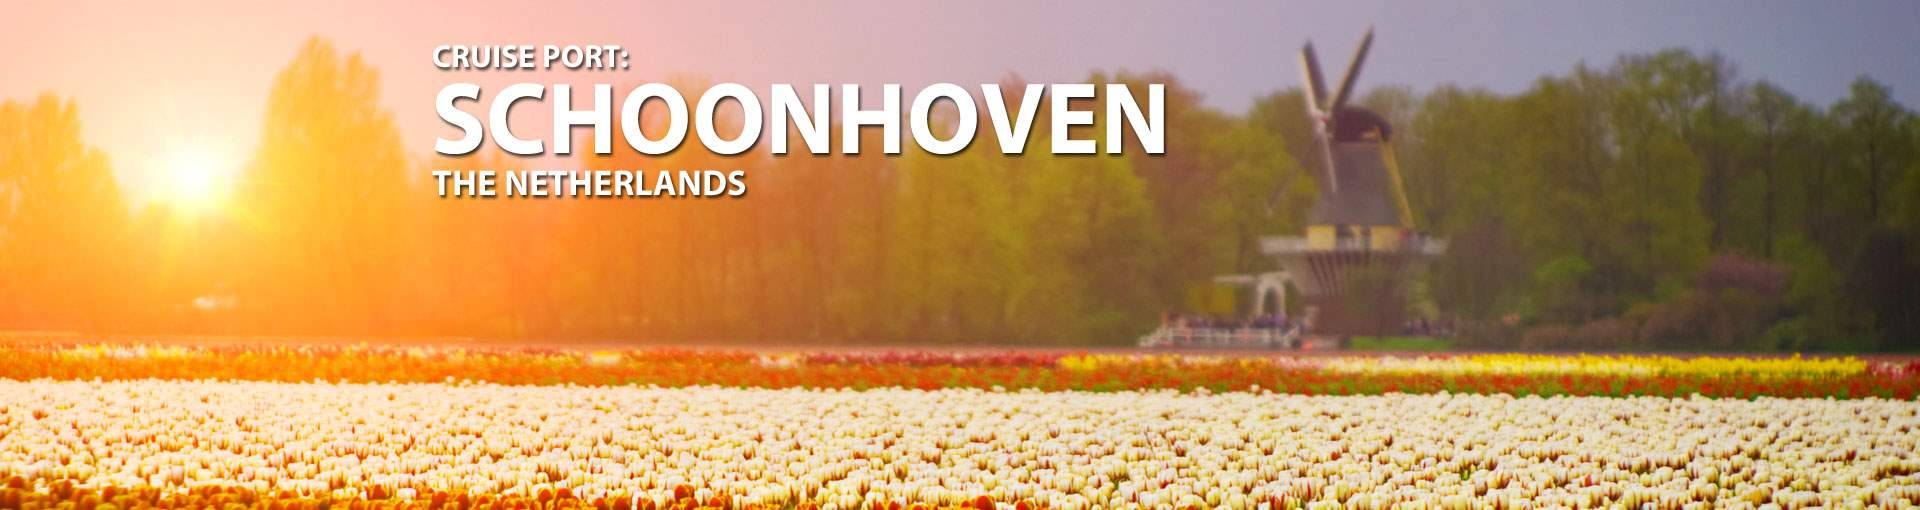 Cruises to Schoonhoven, The Netherlands